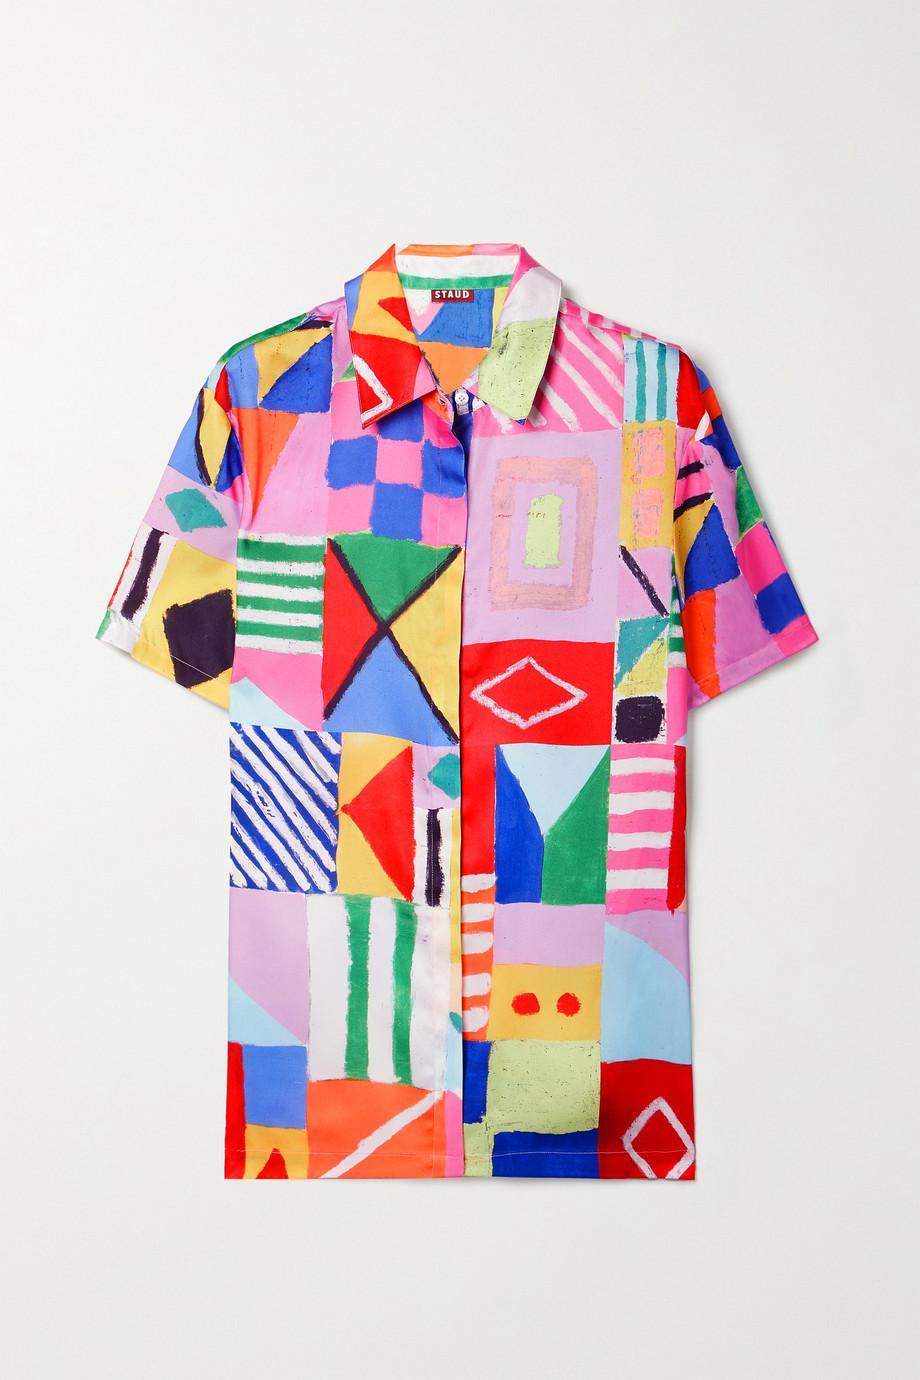 STAUD Pallas oversized printed twill shirt